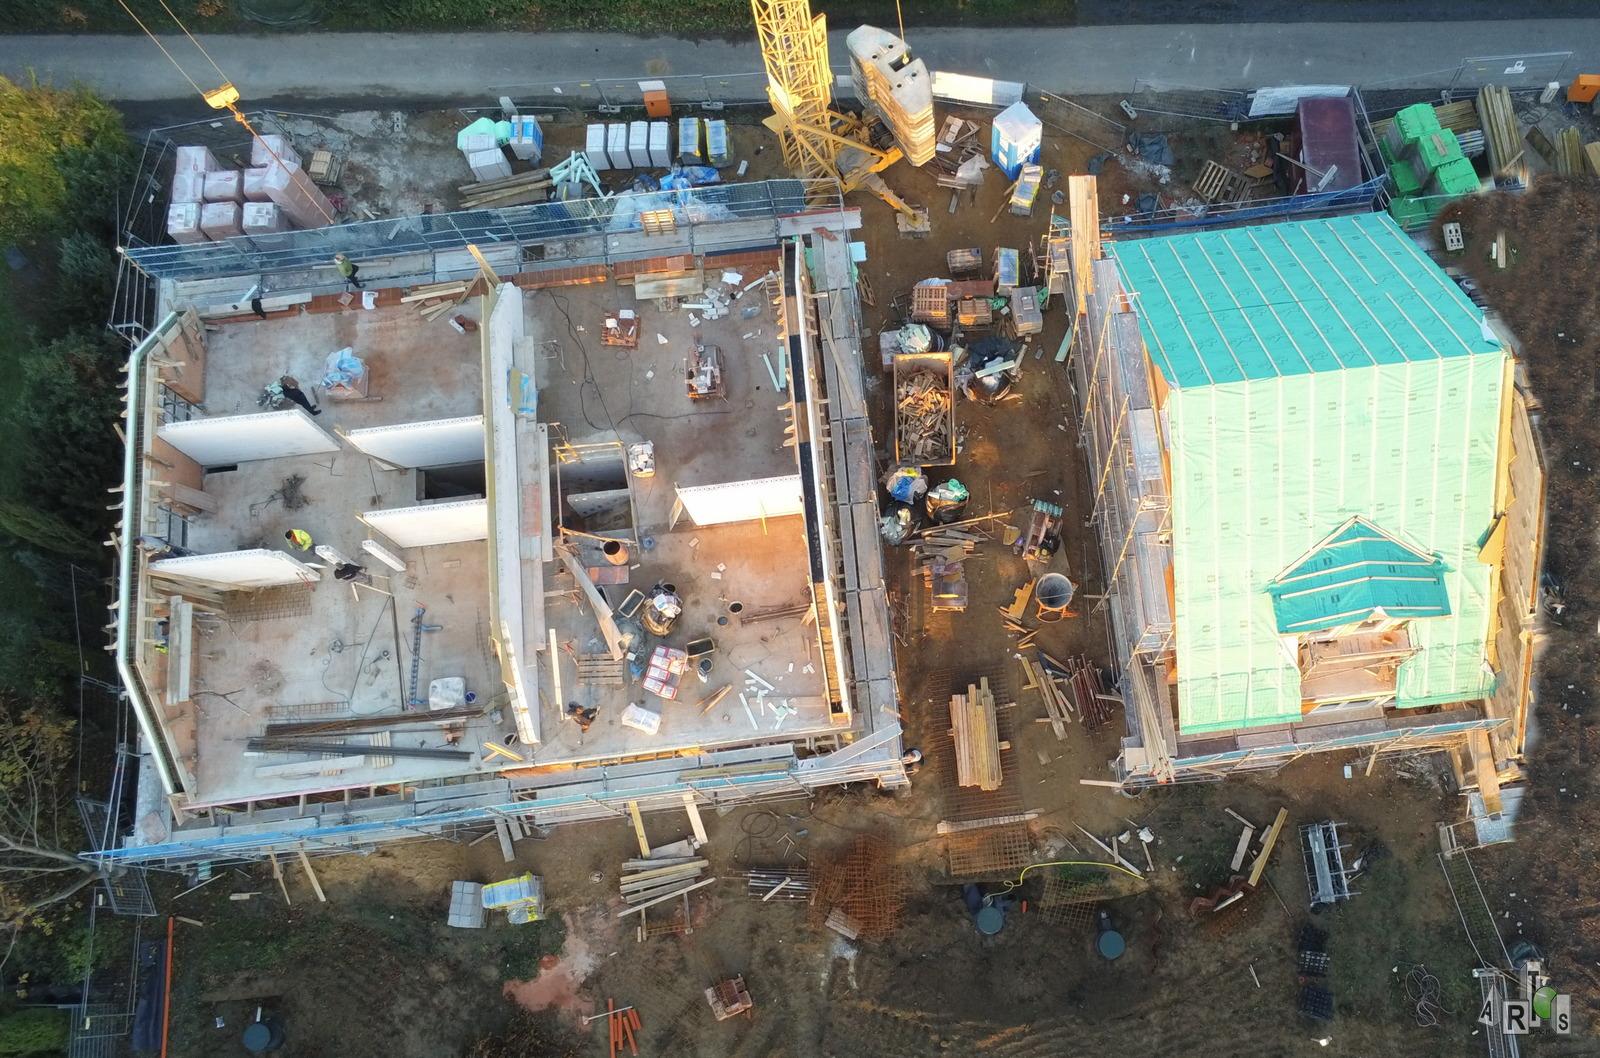 Luftbild unserer Baustelle in Hürth Ende Oktober 2020